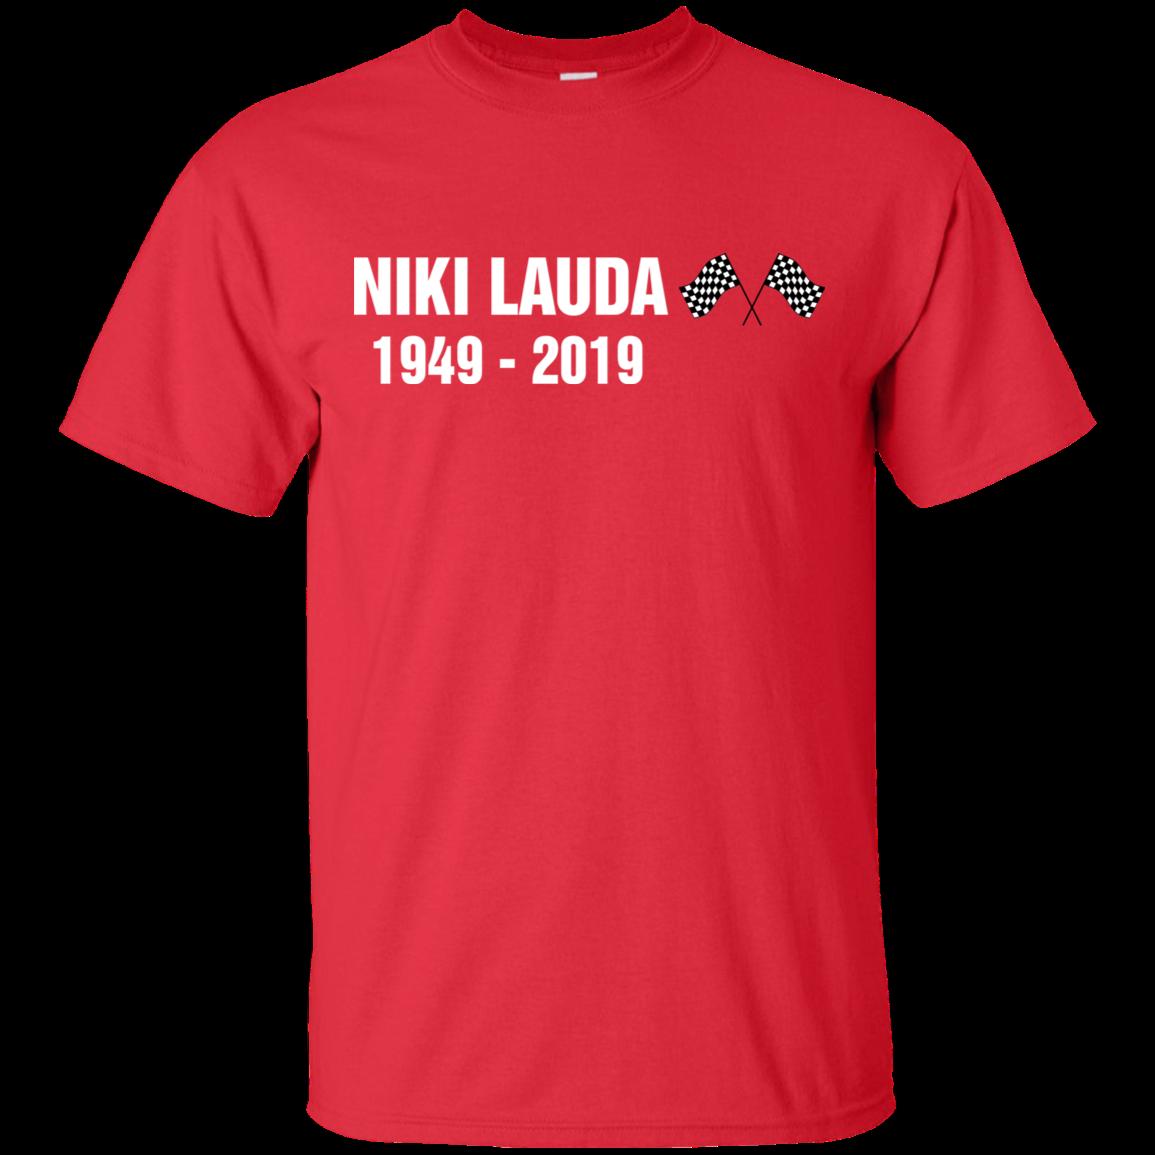 Футболка NIKI LAUDA PILOT гоночная Красная футболка Размер M-3XL